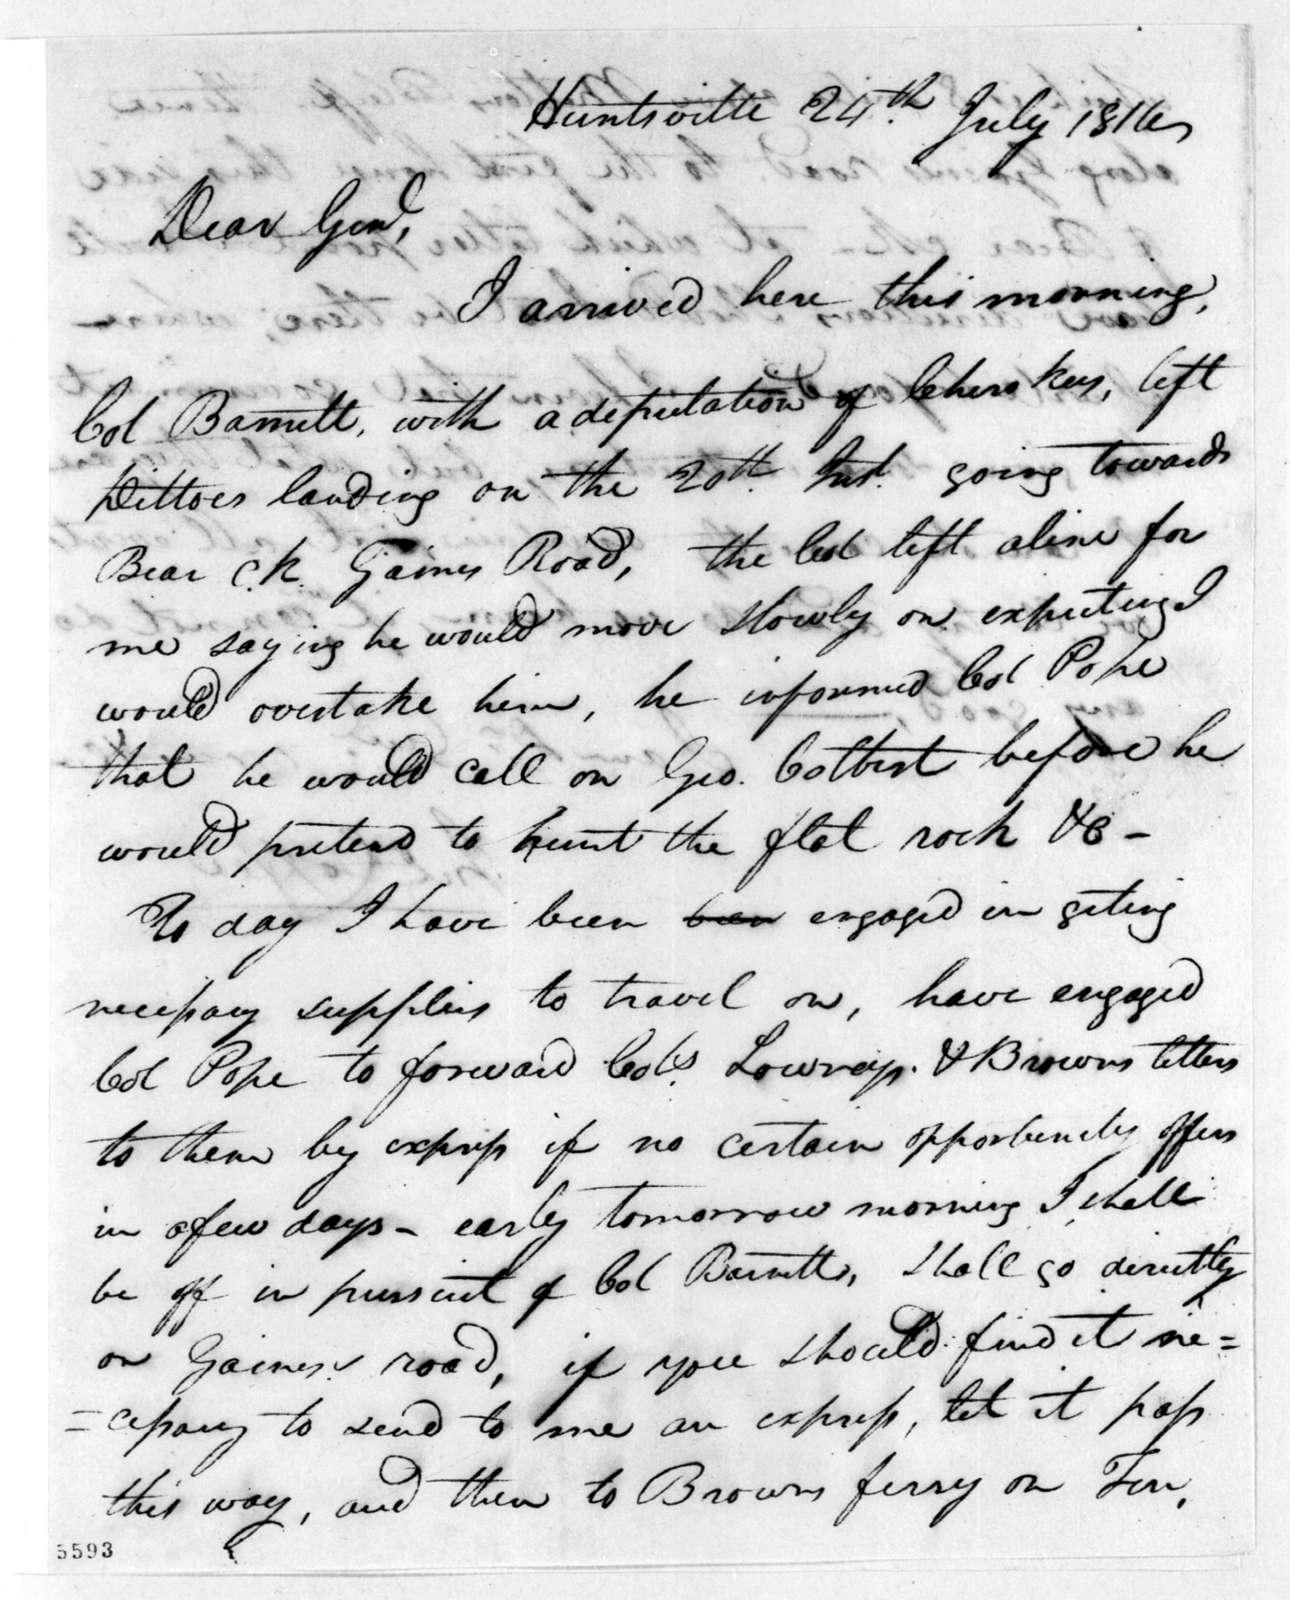 John Coffee to Andrew Jackson, July 24, 1816